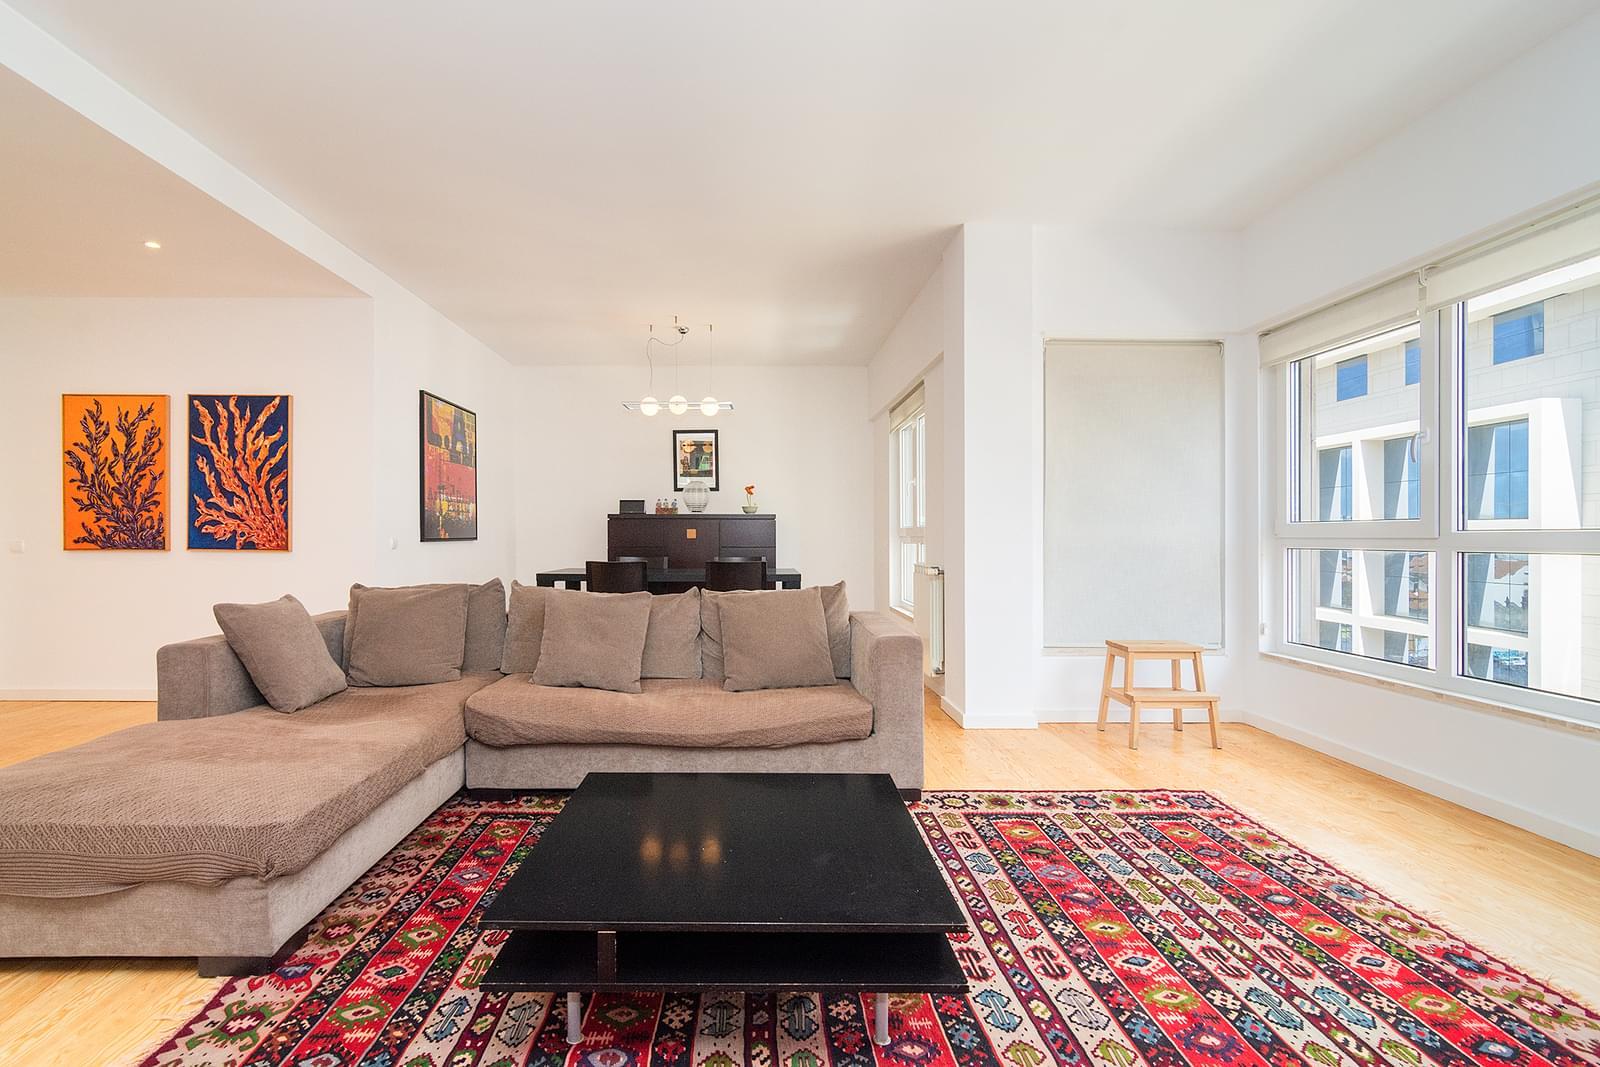 pf14147-apartamento-t3-lisboa-ac43c422-8312-451b-8572-f79f66211144